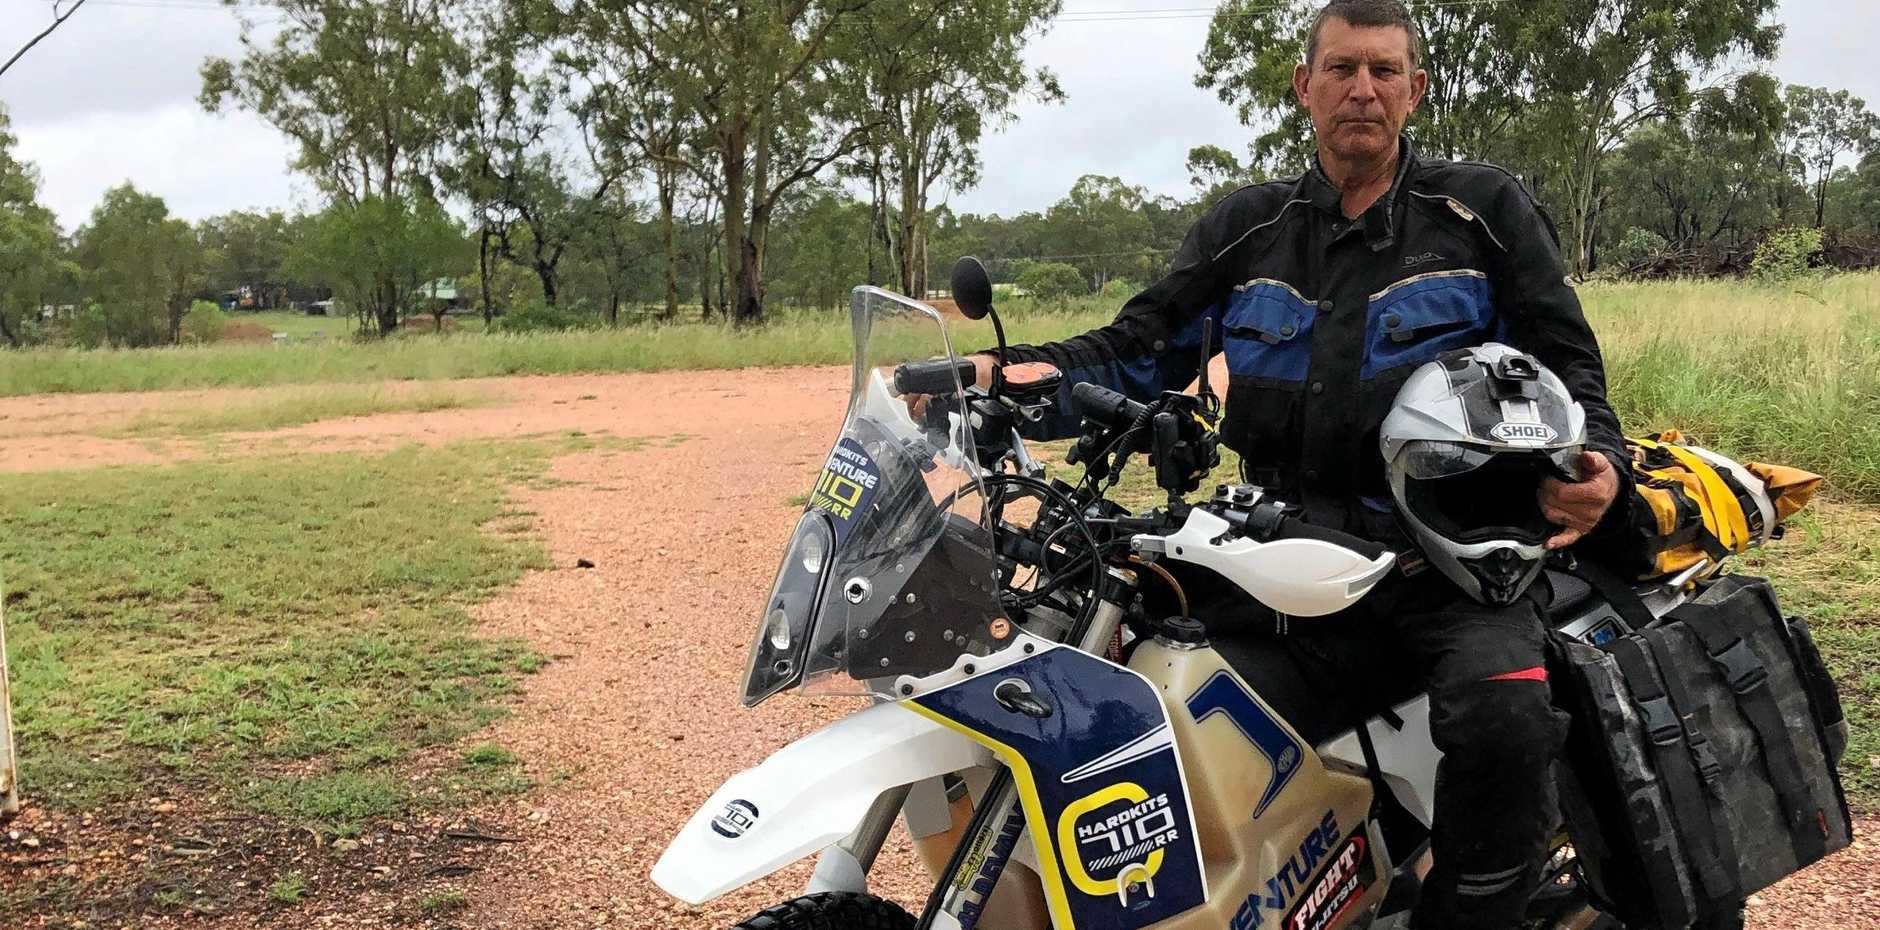 TOUGH TREK: Brett Johnstone is riding 10,000km around Australia to raise money for cancer research.